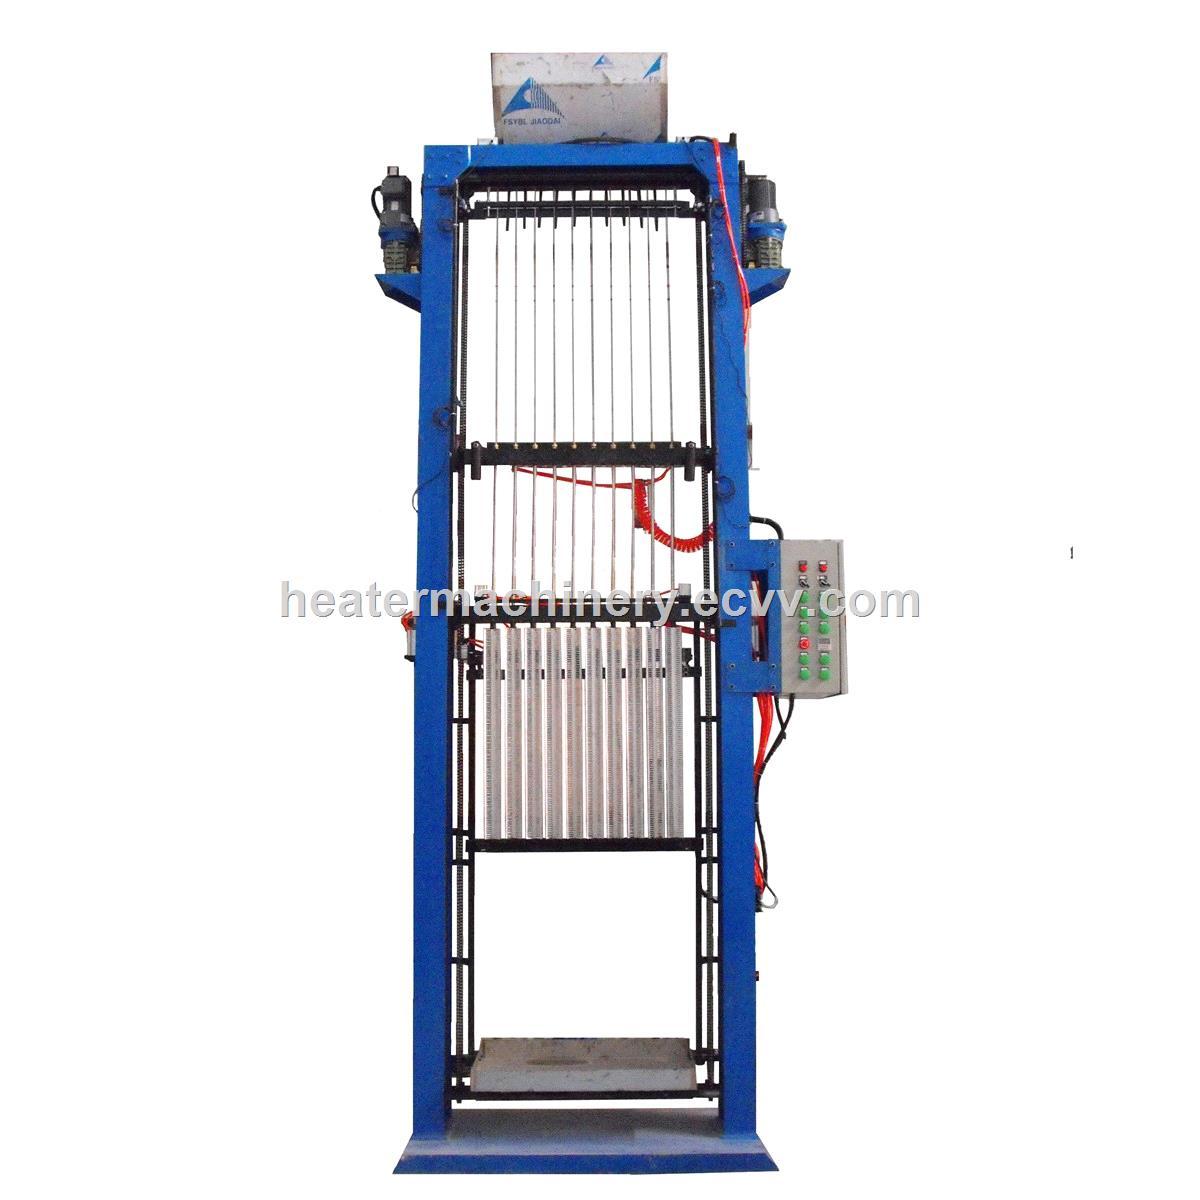 X type aluminum heating element filling machine 10 station